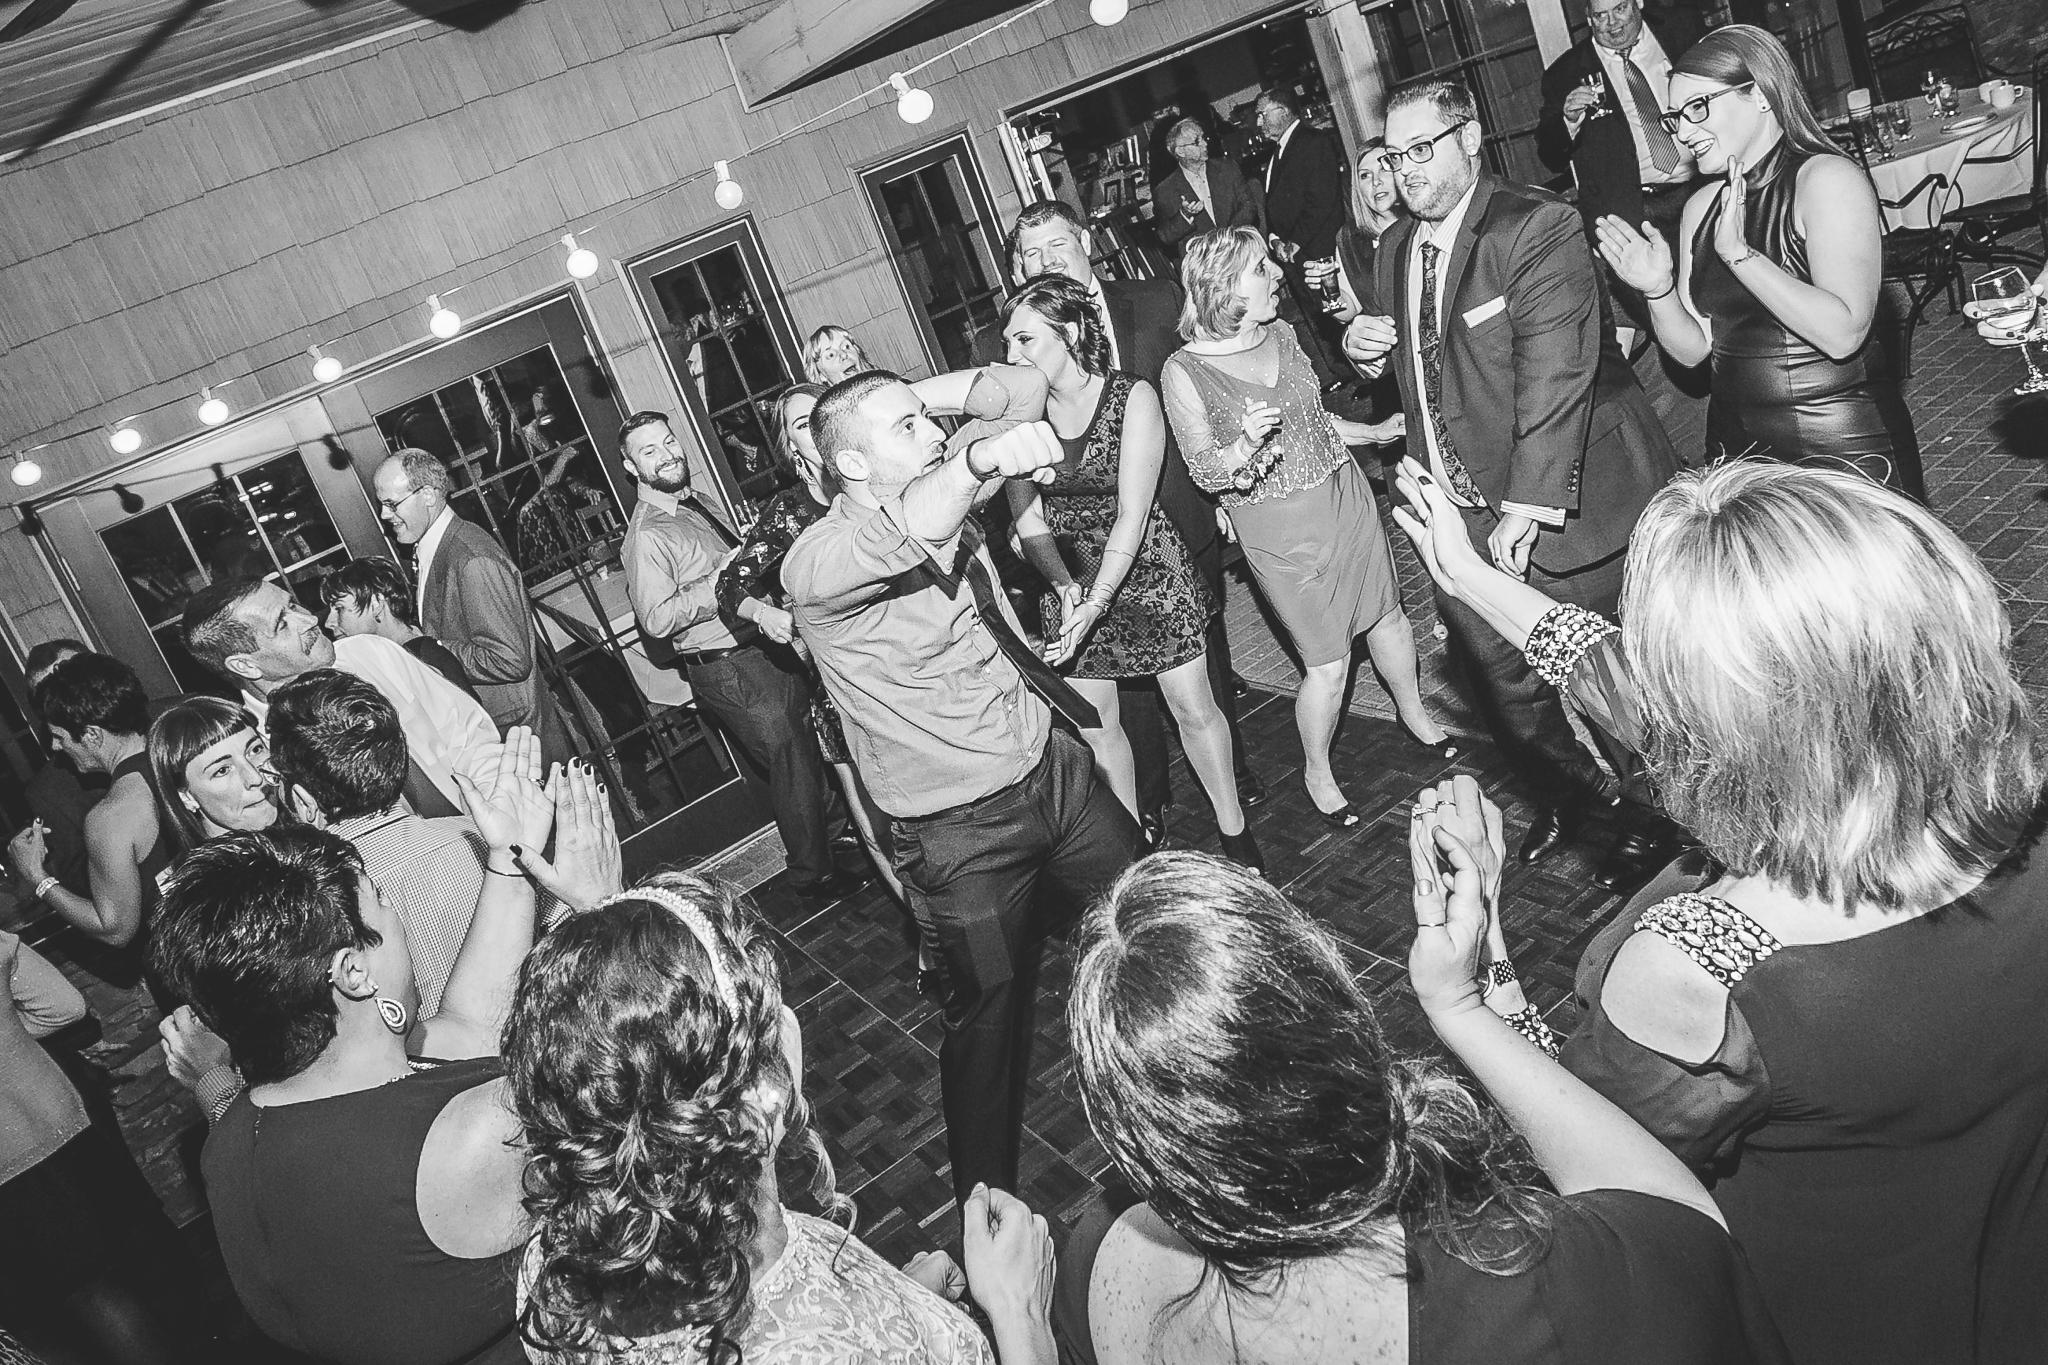 camuglia-whomstudio-chelsea_and_andy-nycphotographer-wedding-brooklyn-buffalo-timberlodge-161-5713.jpg